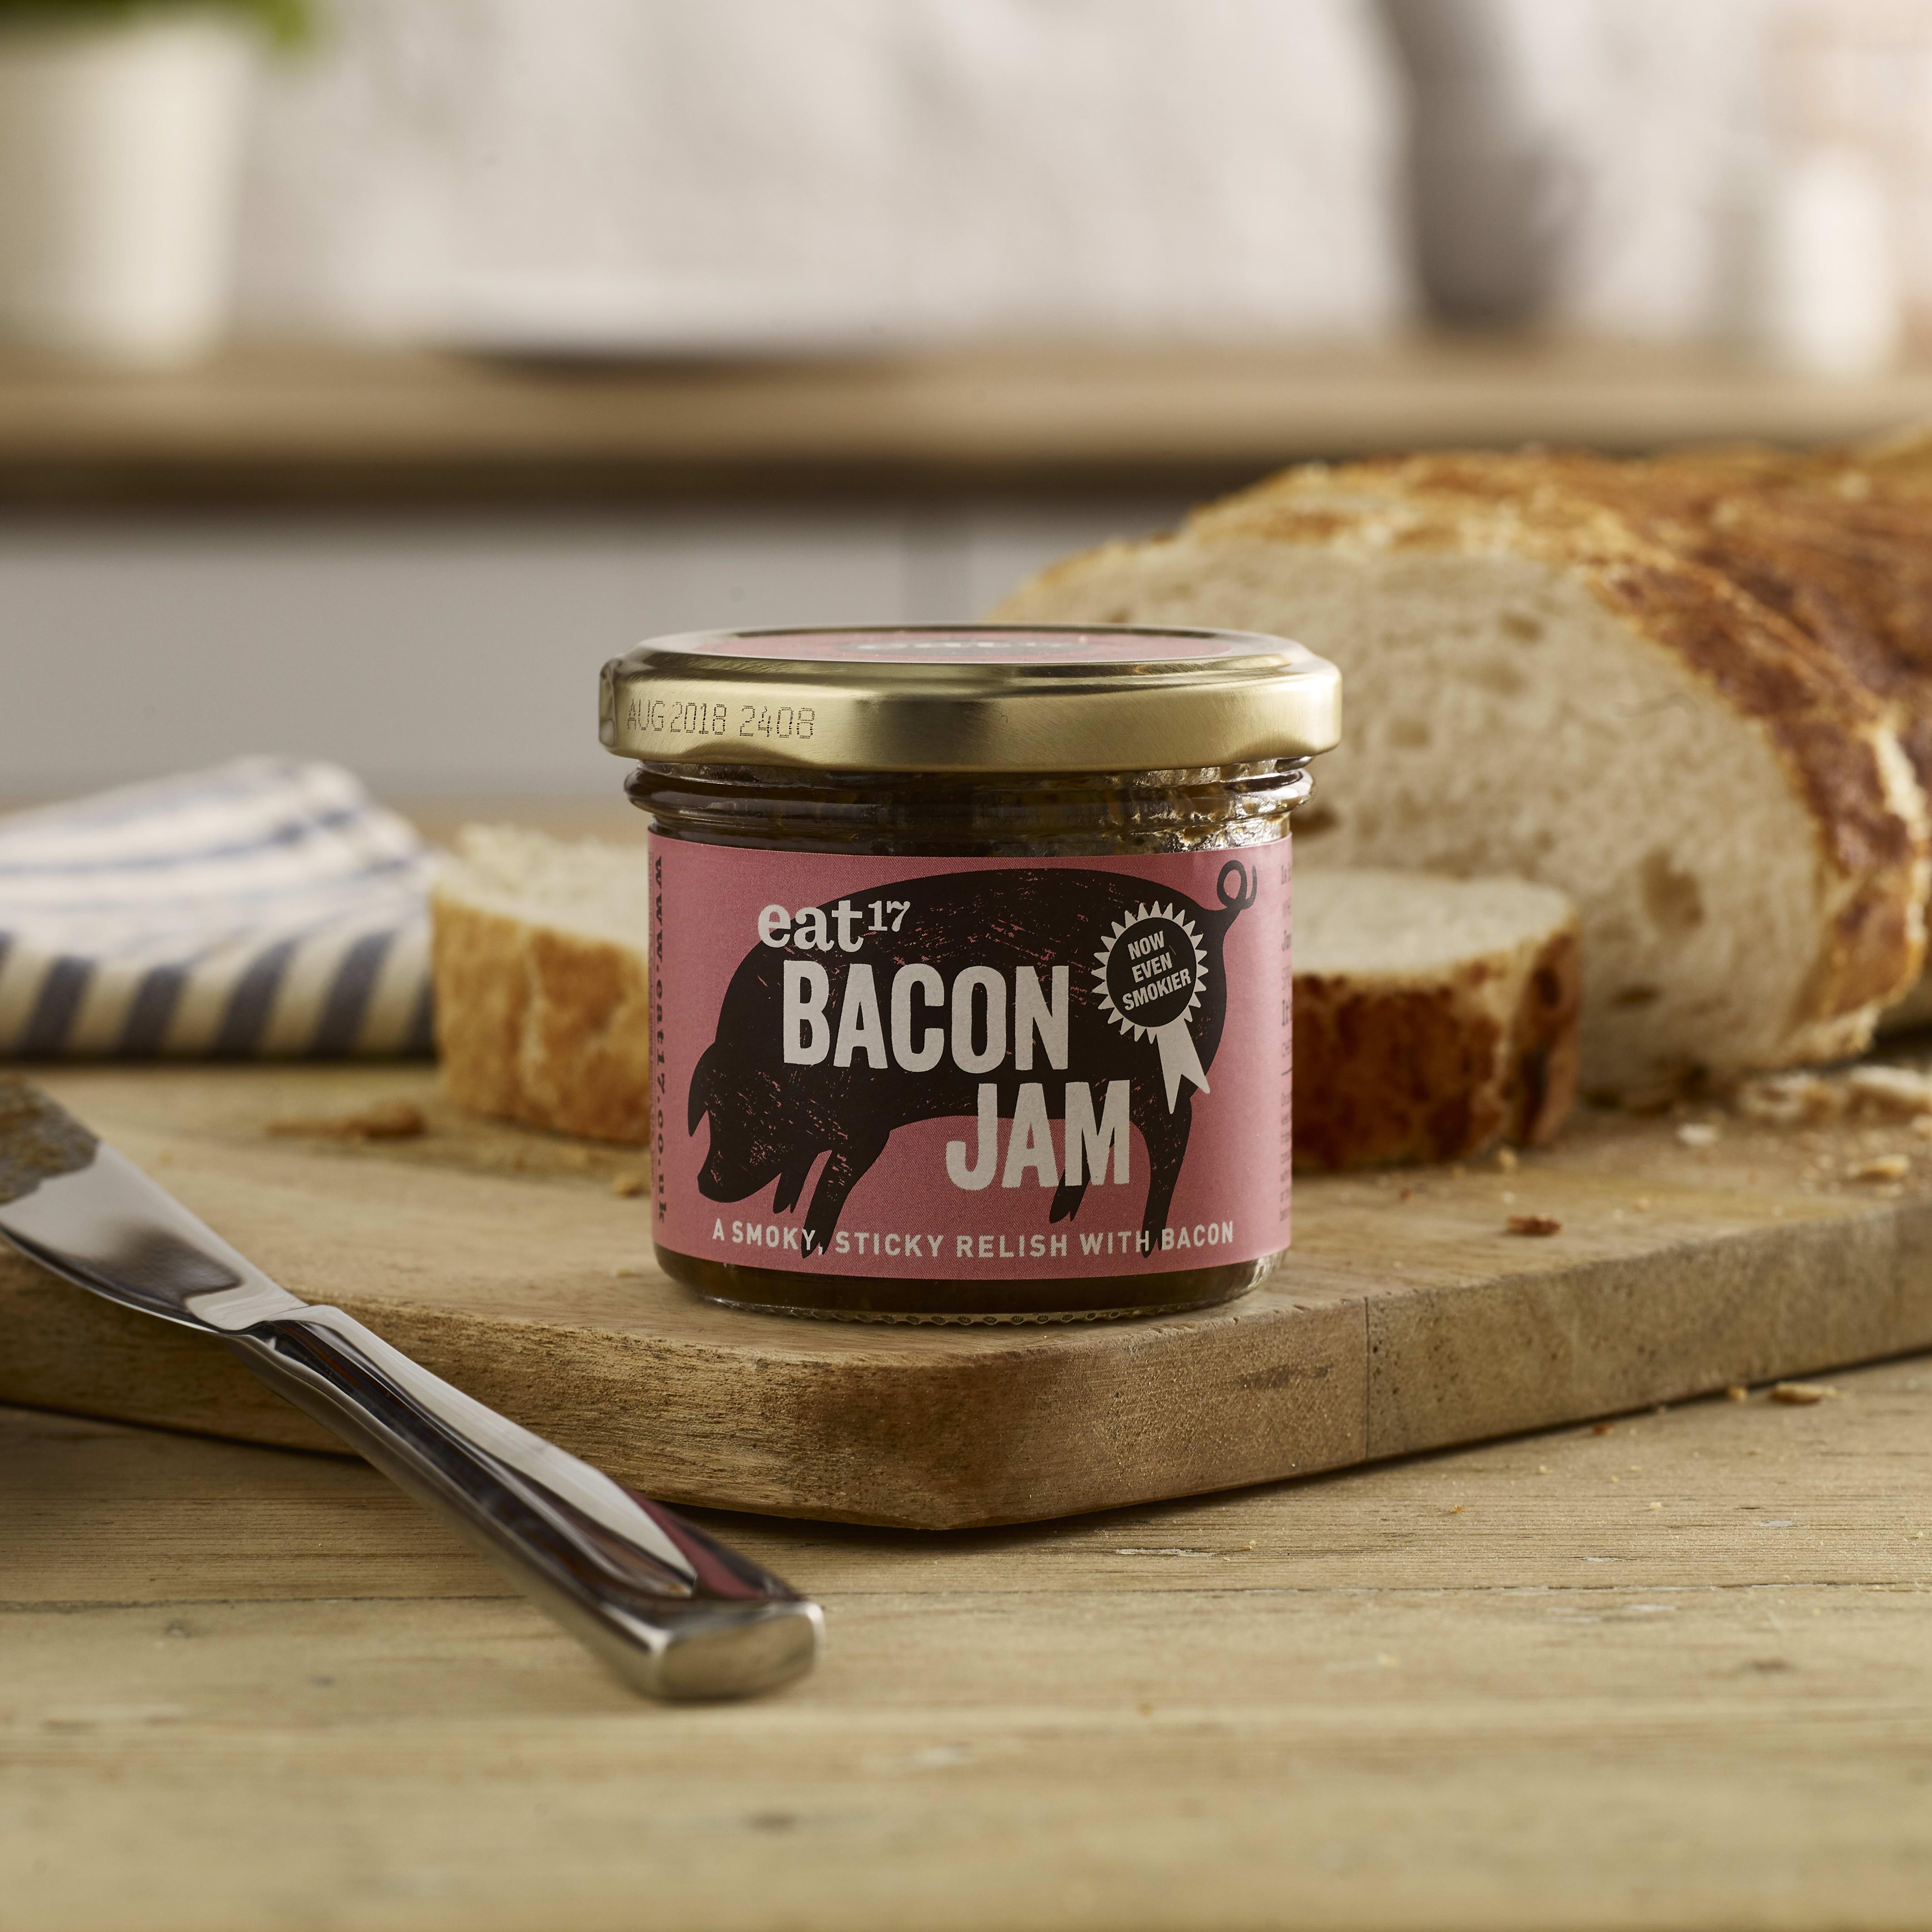 Eat 17 Bacon Jam, 105g